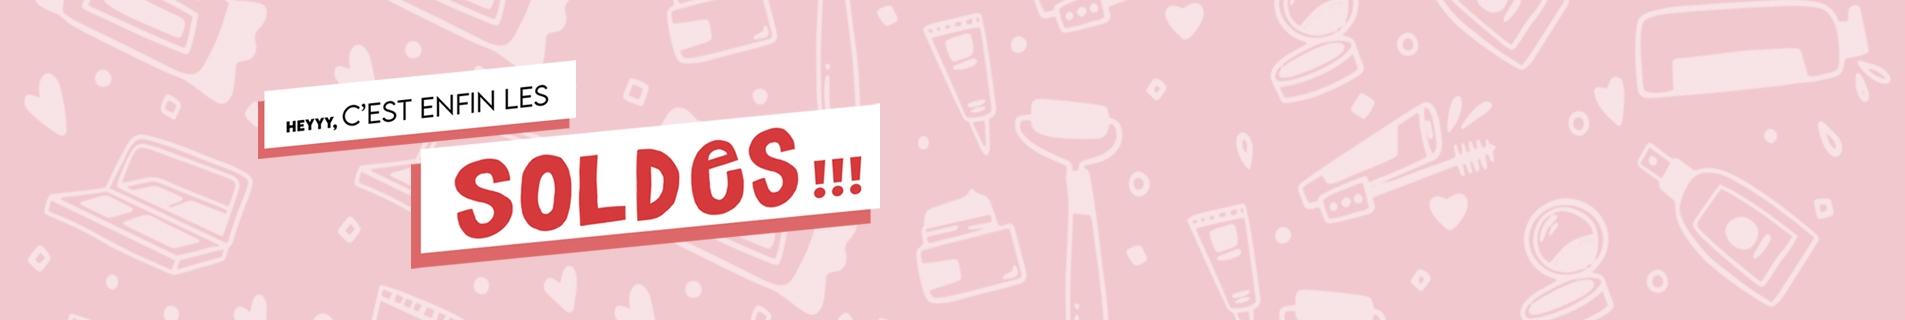 Soldes vernis à ongles   Site de maquillage   SAGA Cosmetics